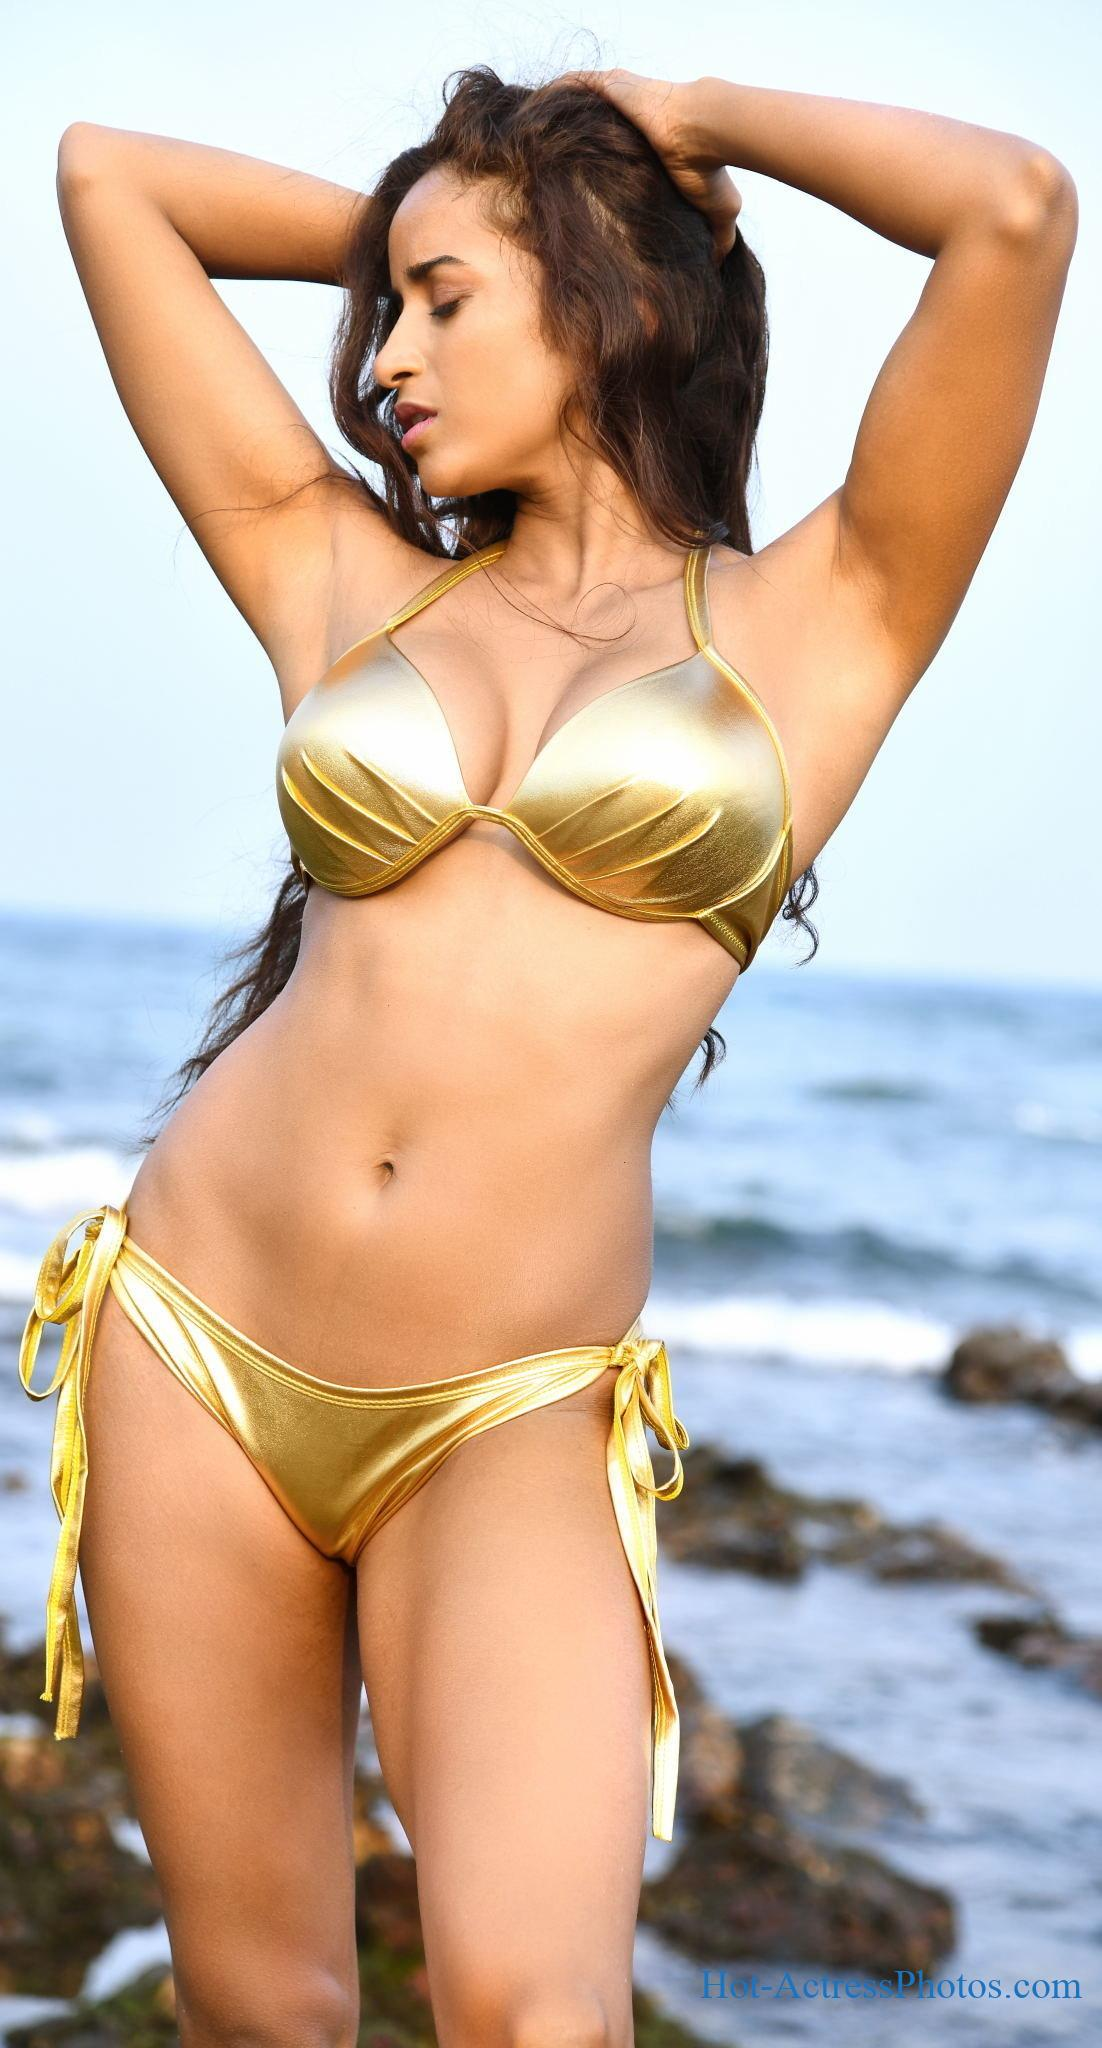 Pooja Bhalekar Hot Cleavage And Navel Photos